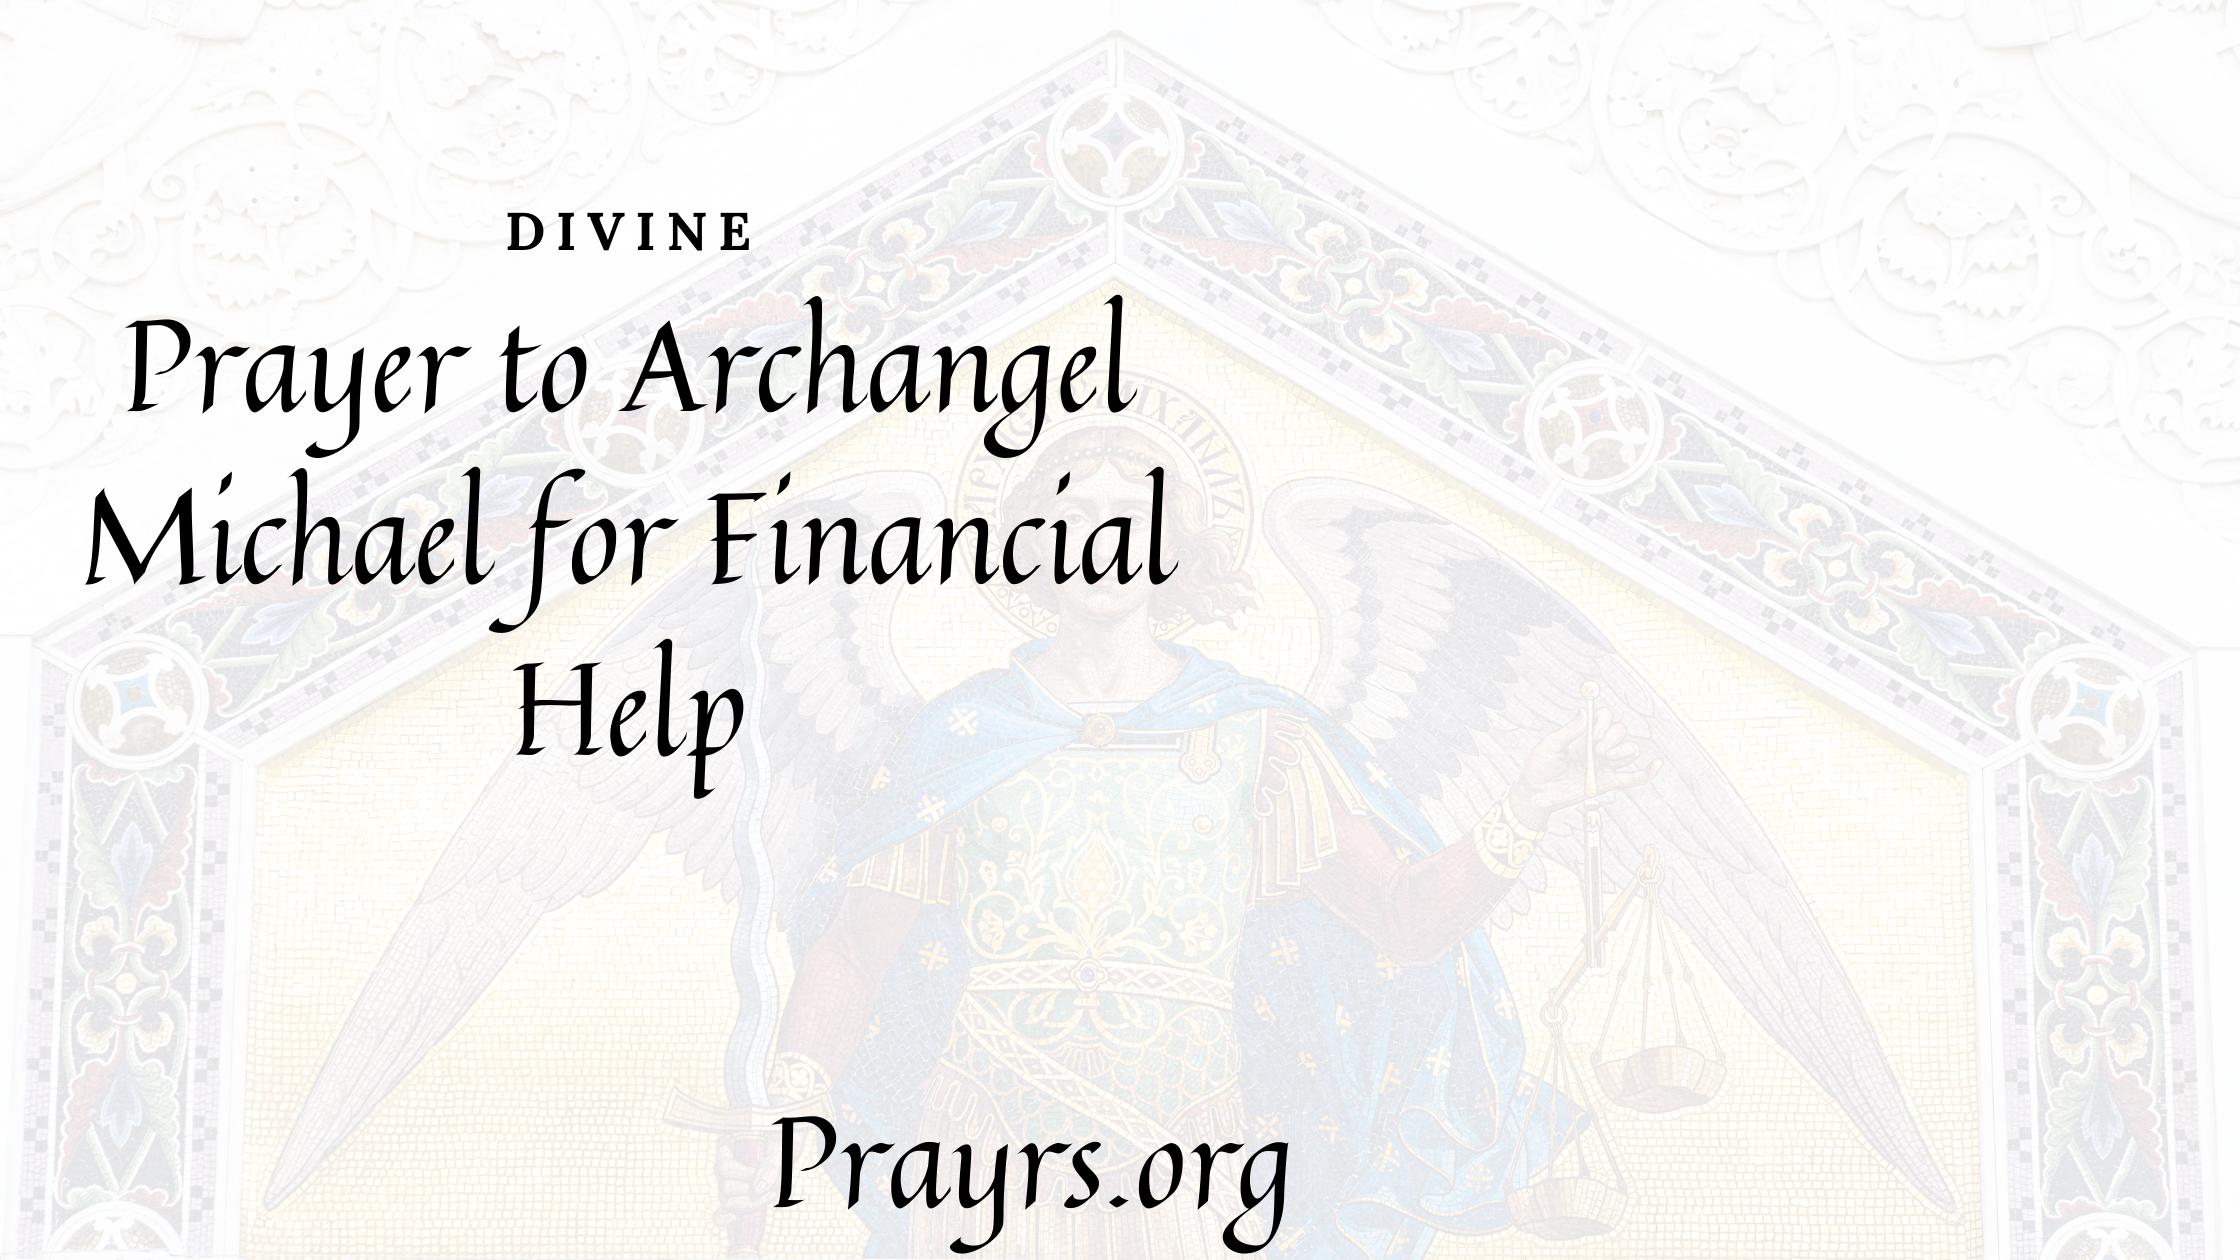 Divine Prayer to Archangel Michael for Financial Help